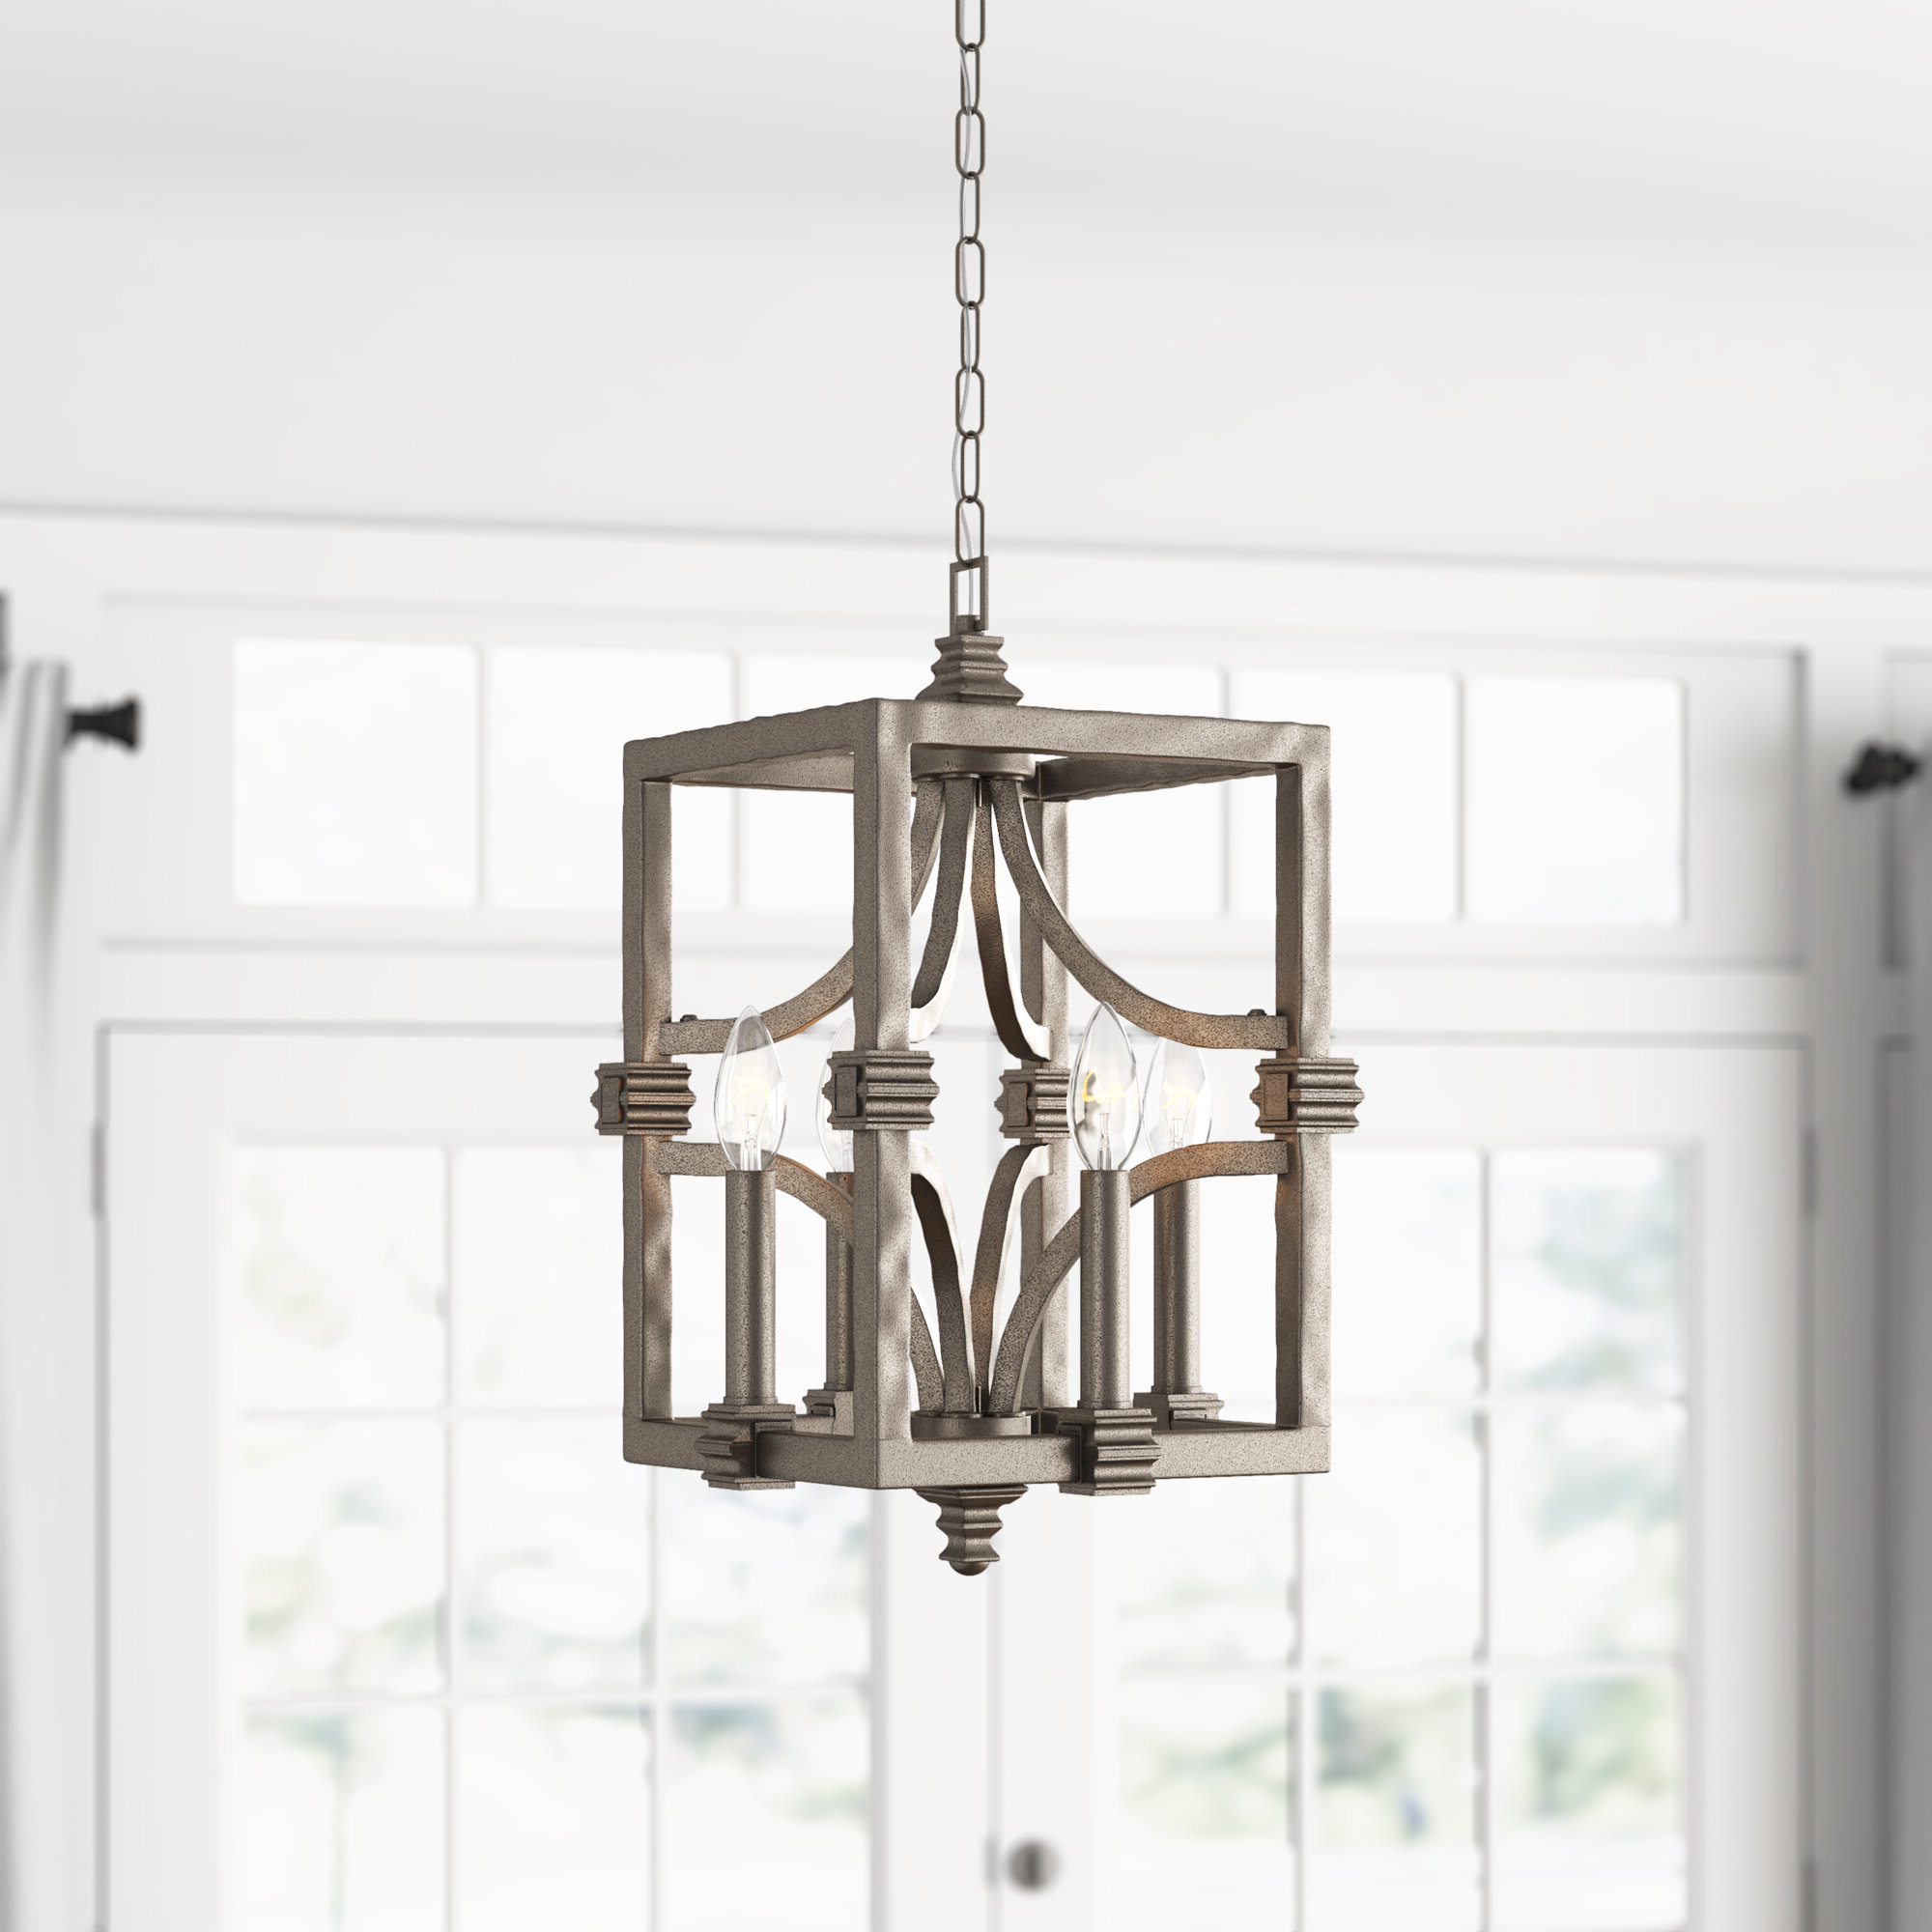 Freeburg 4 Light Lantern Square / Rectangle Pendant Throughout Famous Armande 4 Light Lantern Drum Pendants (View 13 of 25)